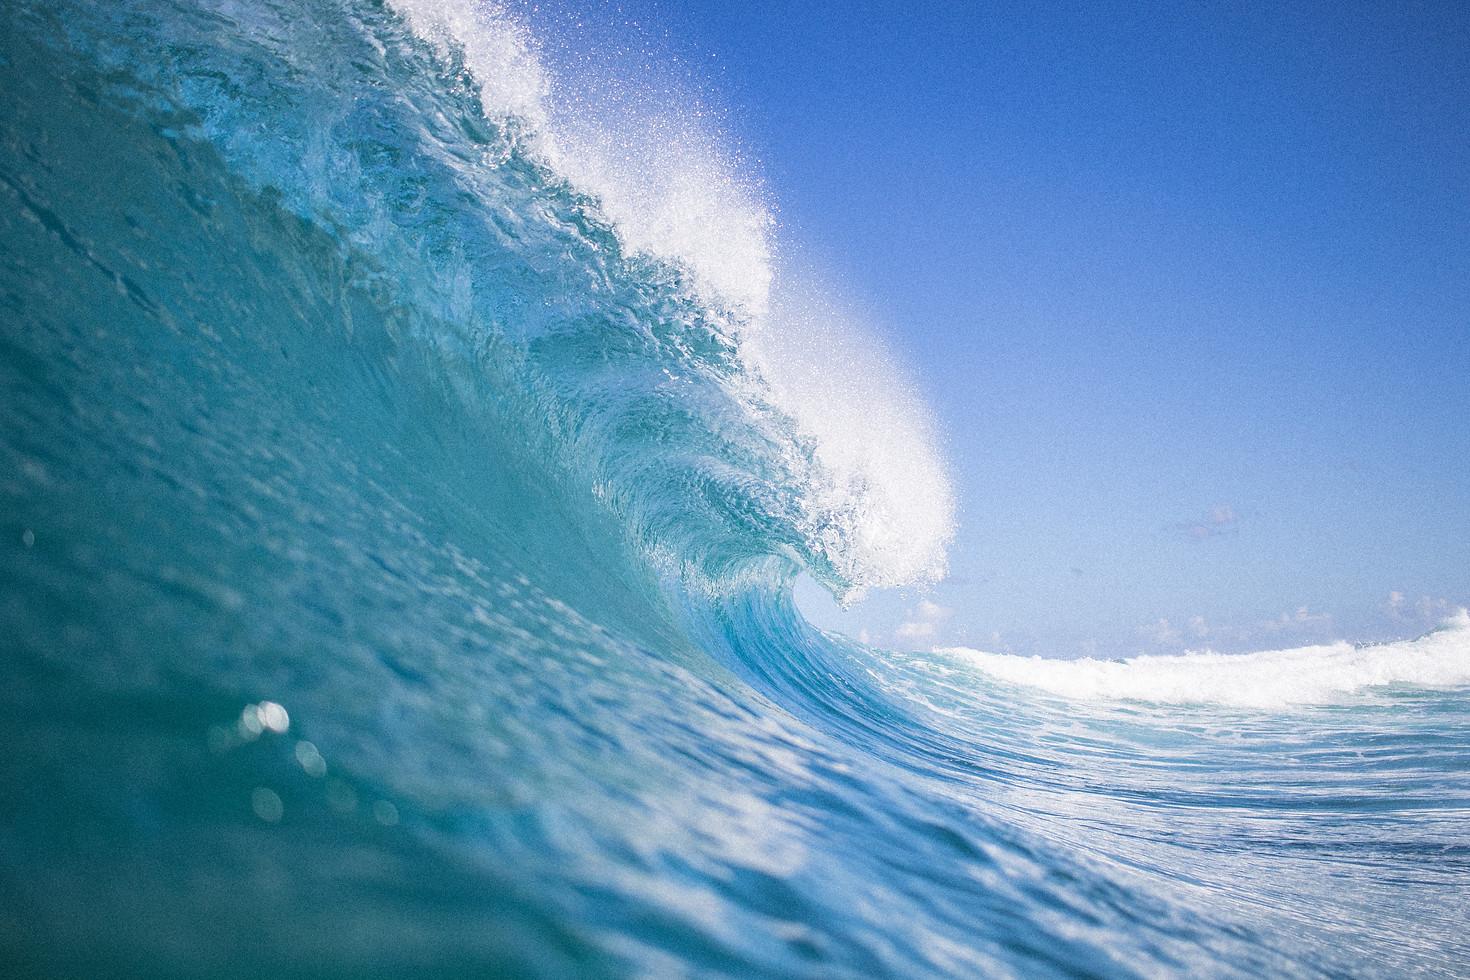 wave break pic.jpg